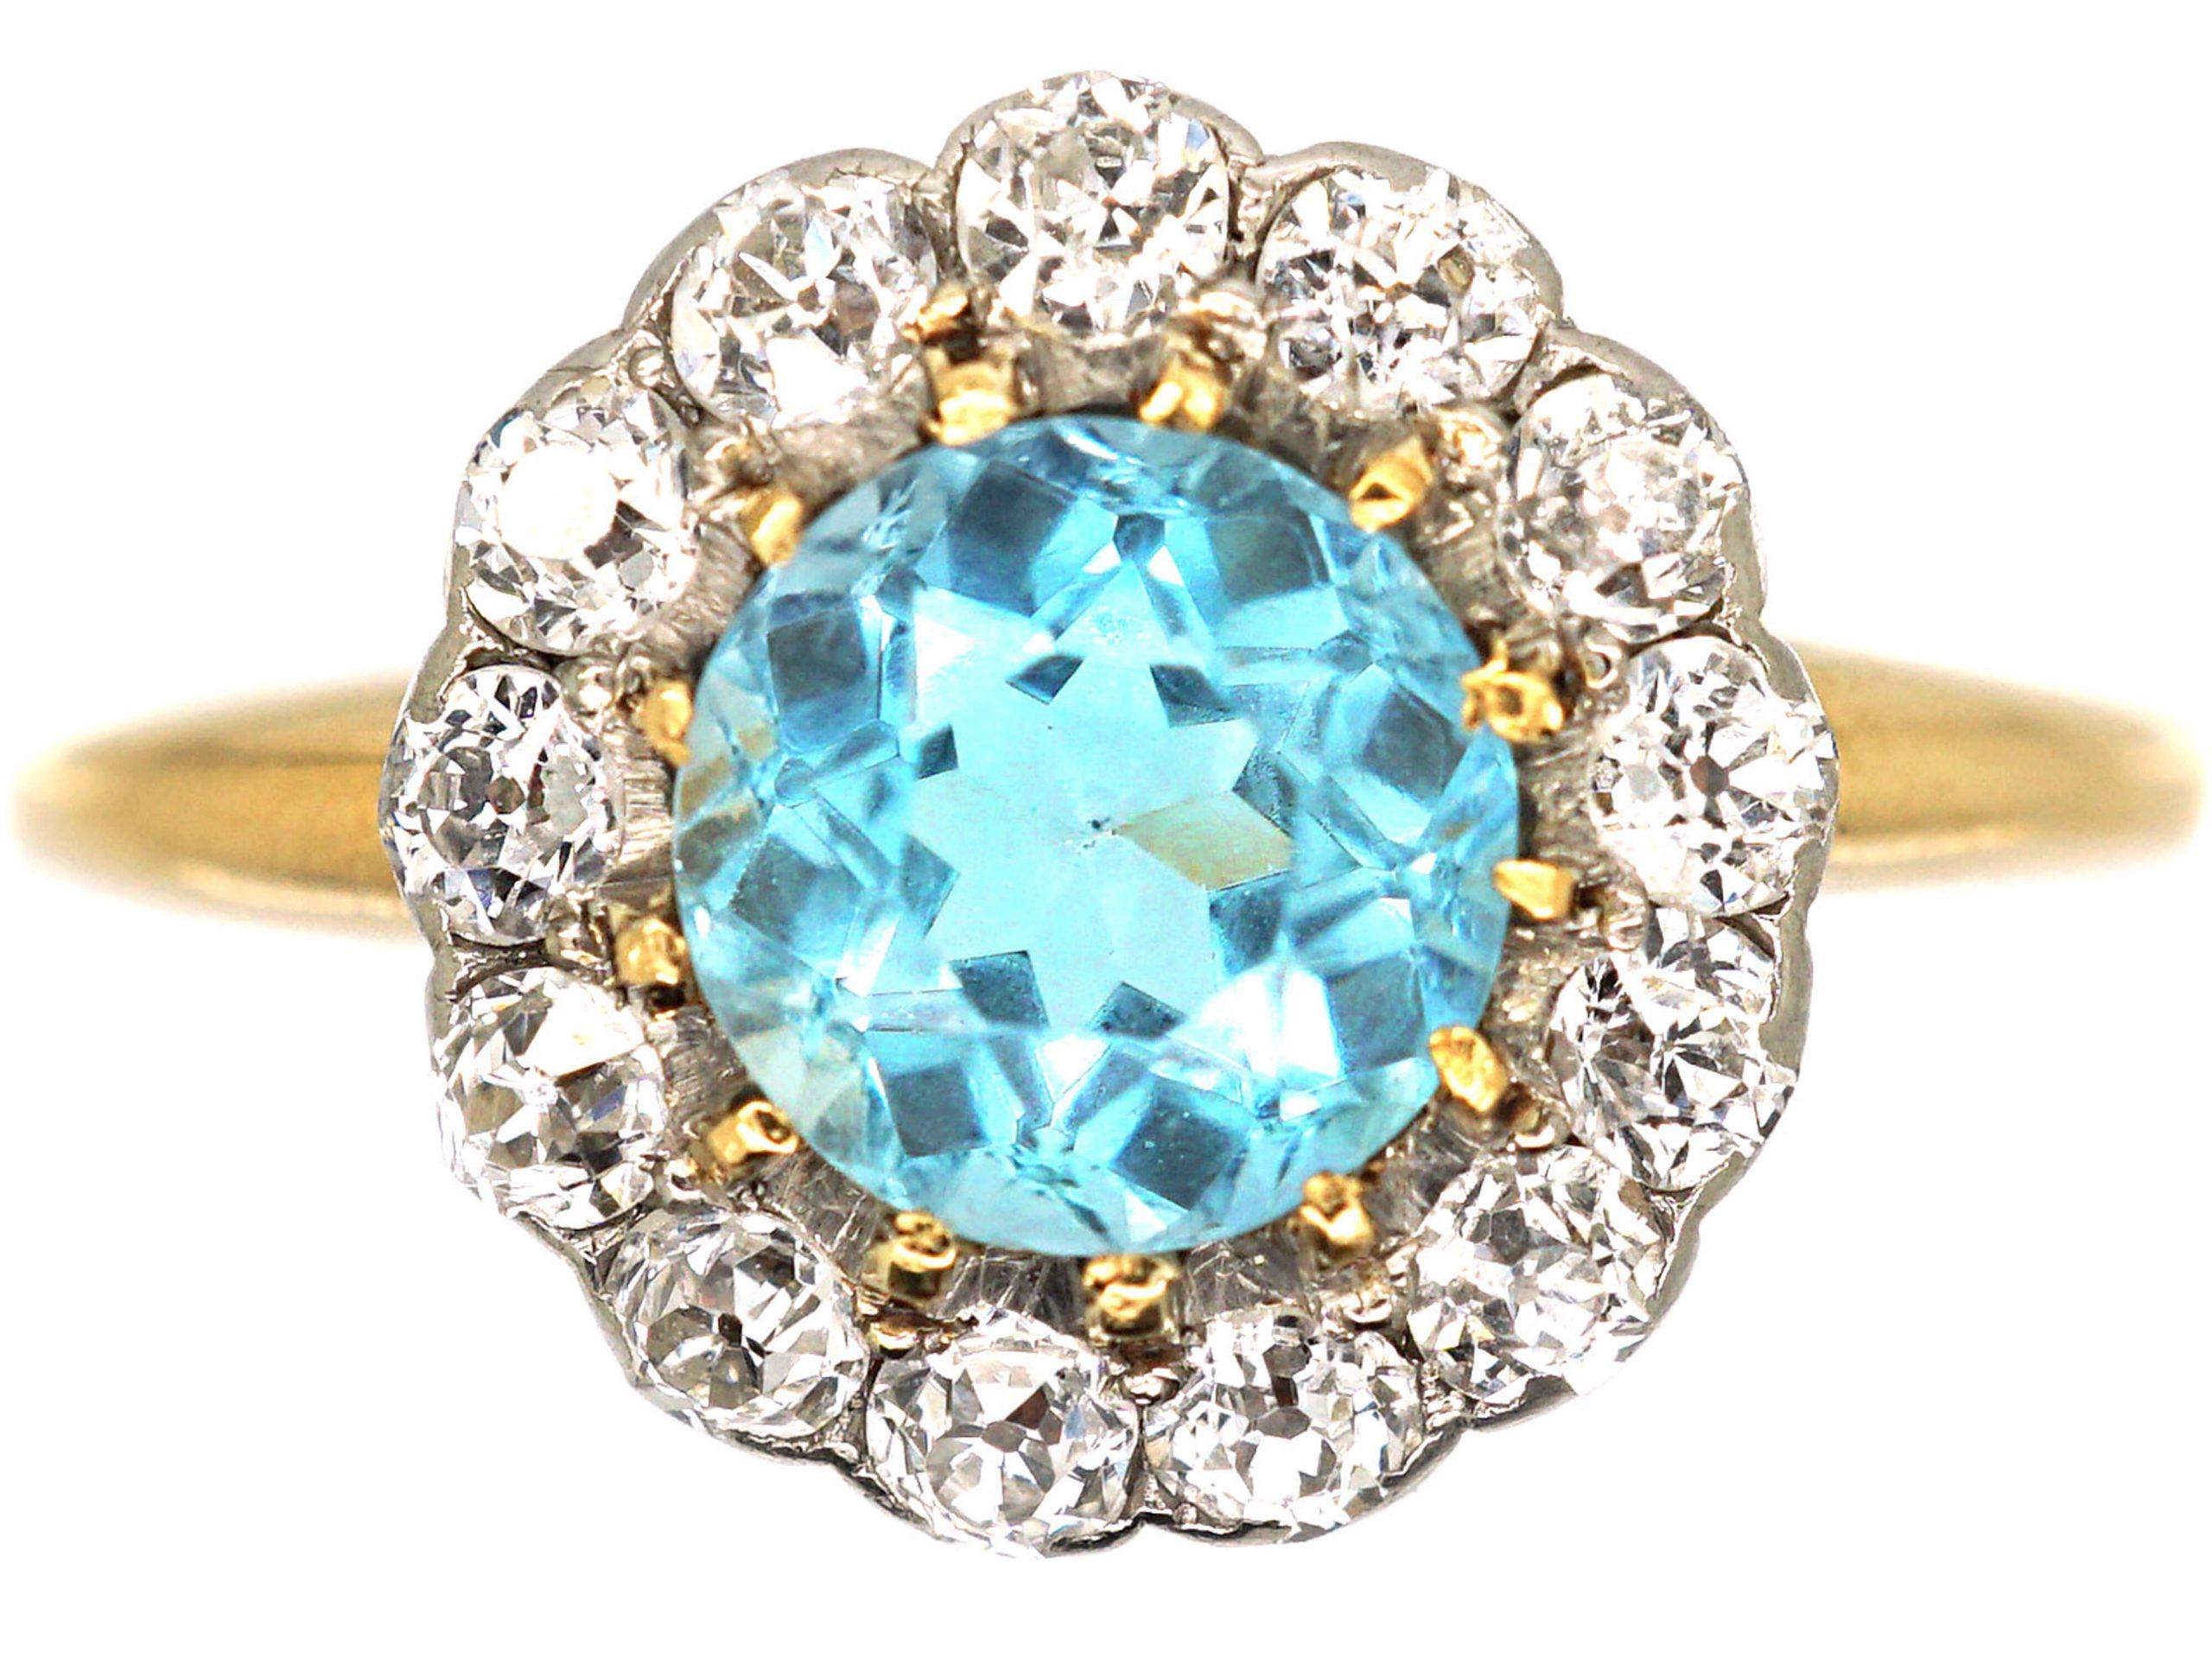 Edwardian 18ct Gold & Platinum, Aquamarine & Diamond Cluster Ring